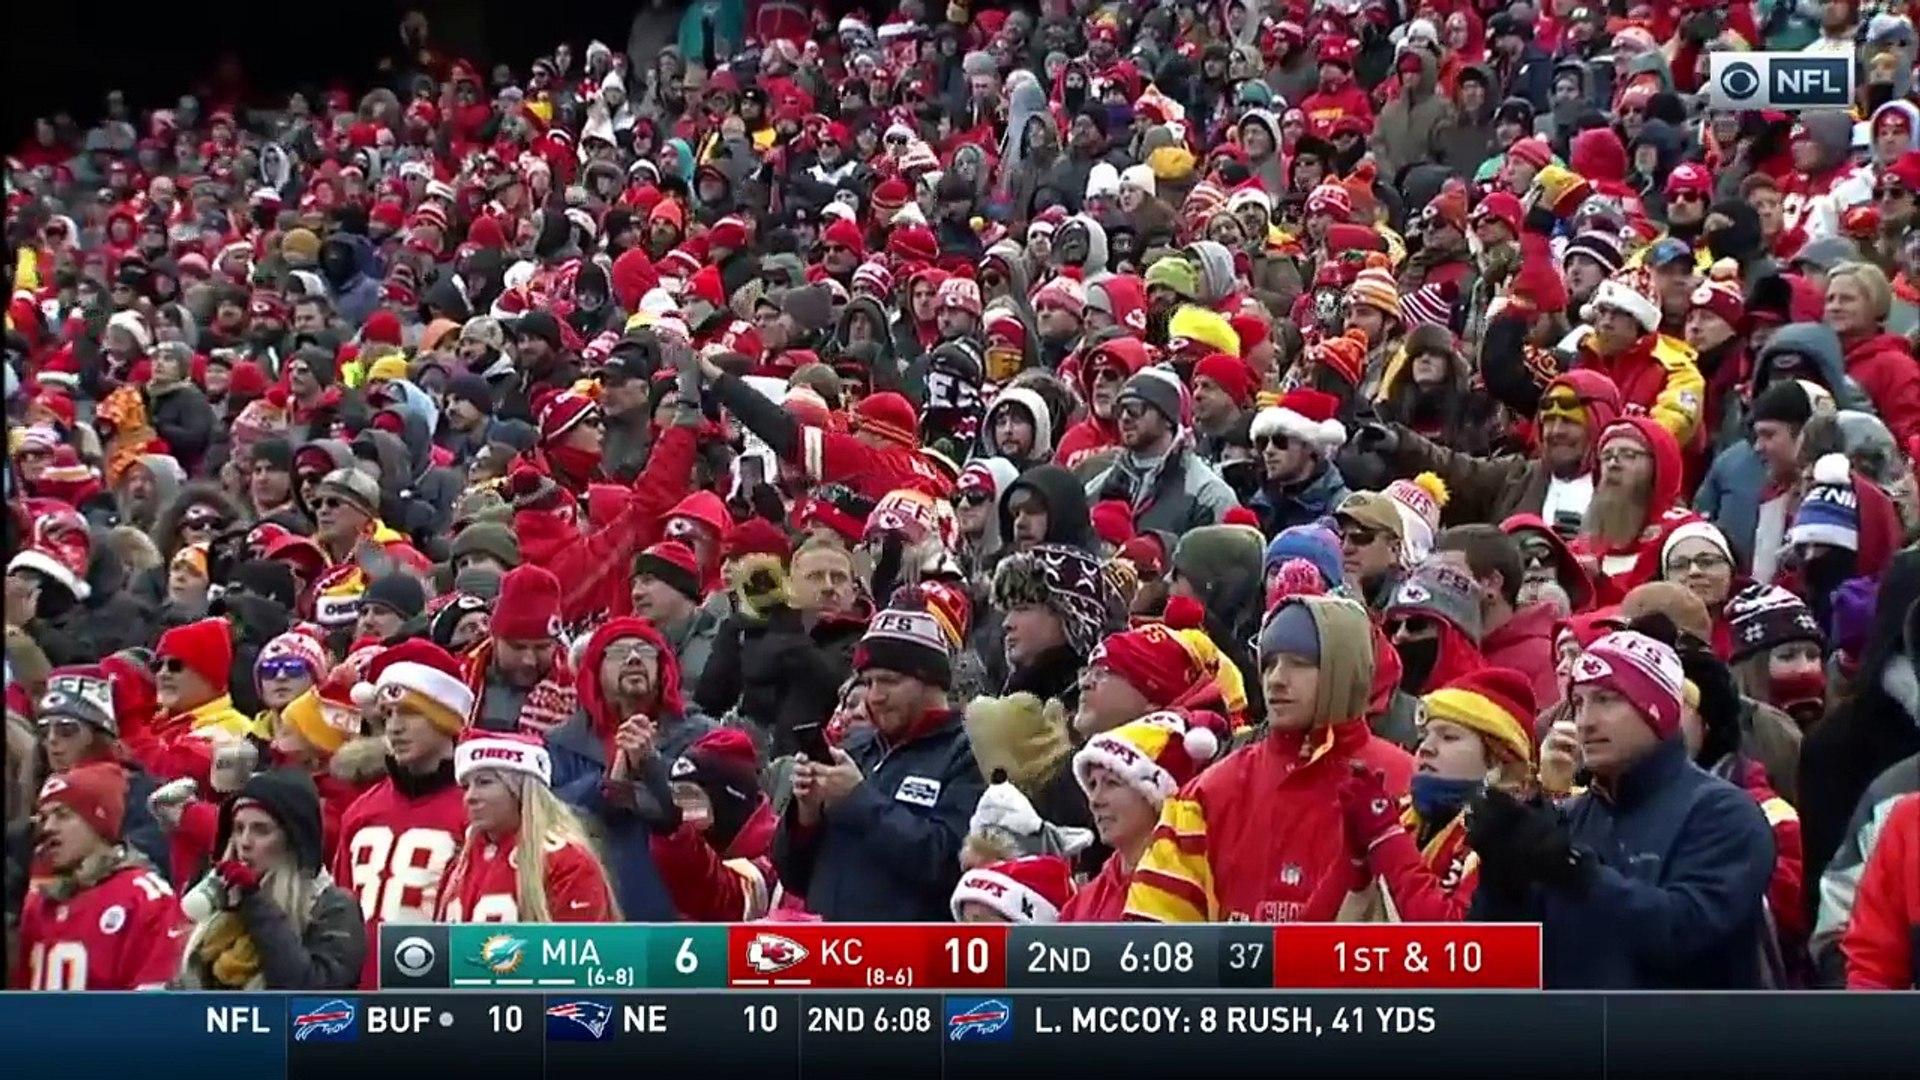 Kareem Hunt Highlights | Dolphins vs. Chiefs | NFL Wk 16 Player Highlights